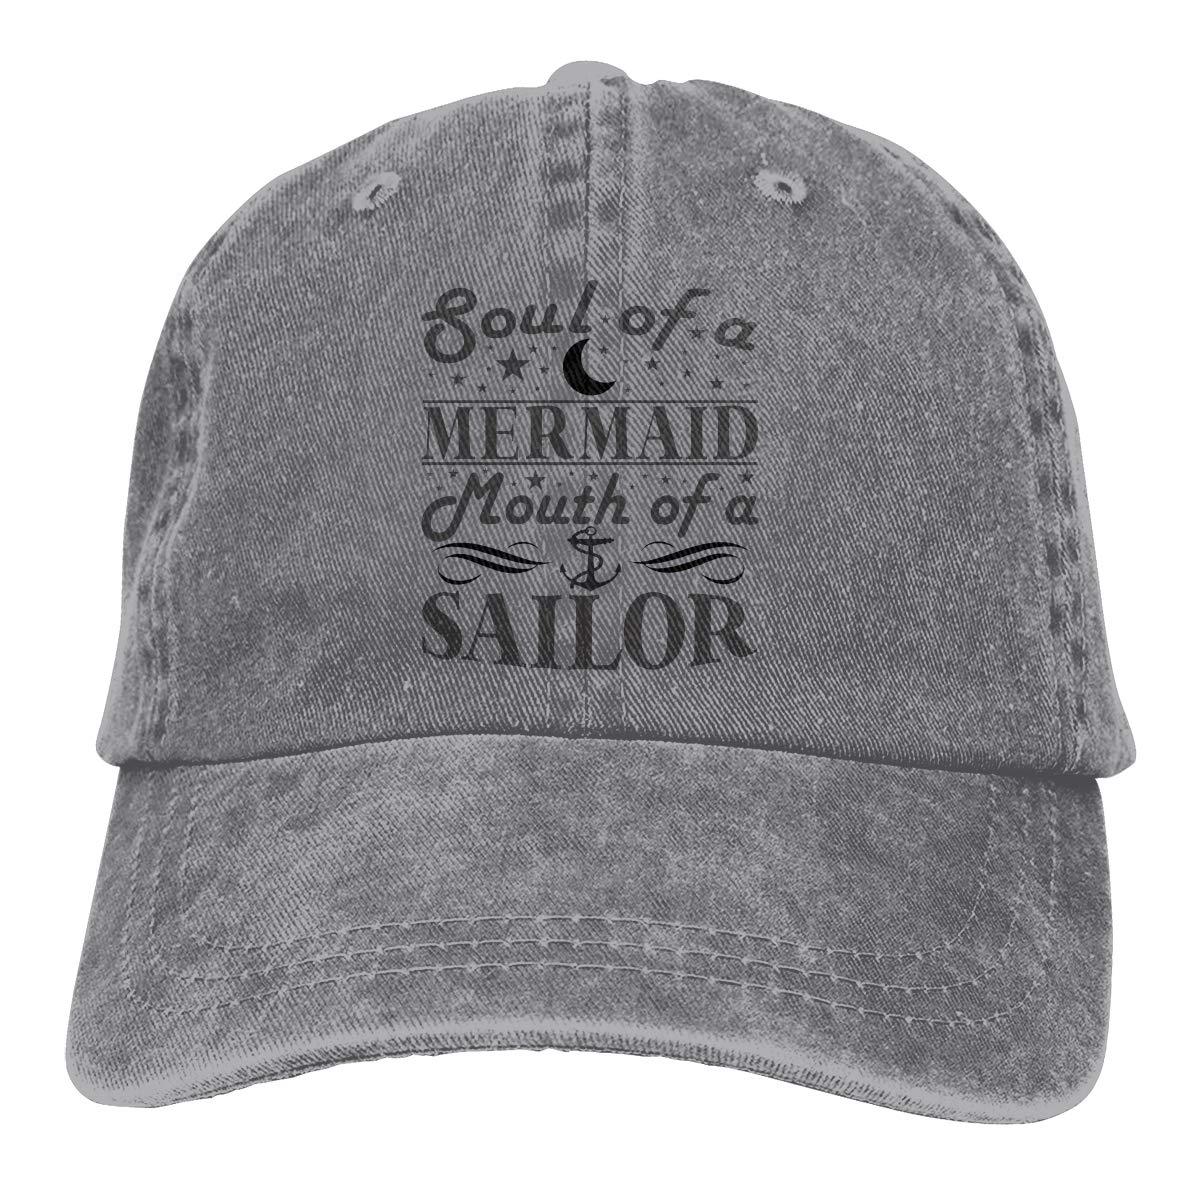 Soul of Mermaid Mouth of Sailor Mens Woman Handsome Cap Classical Hat Fishion Chapeau